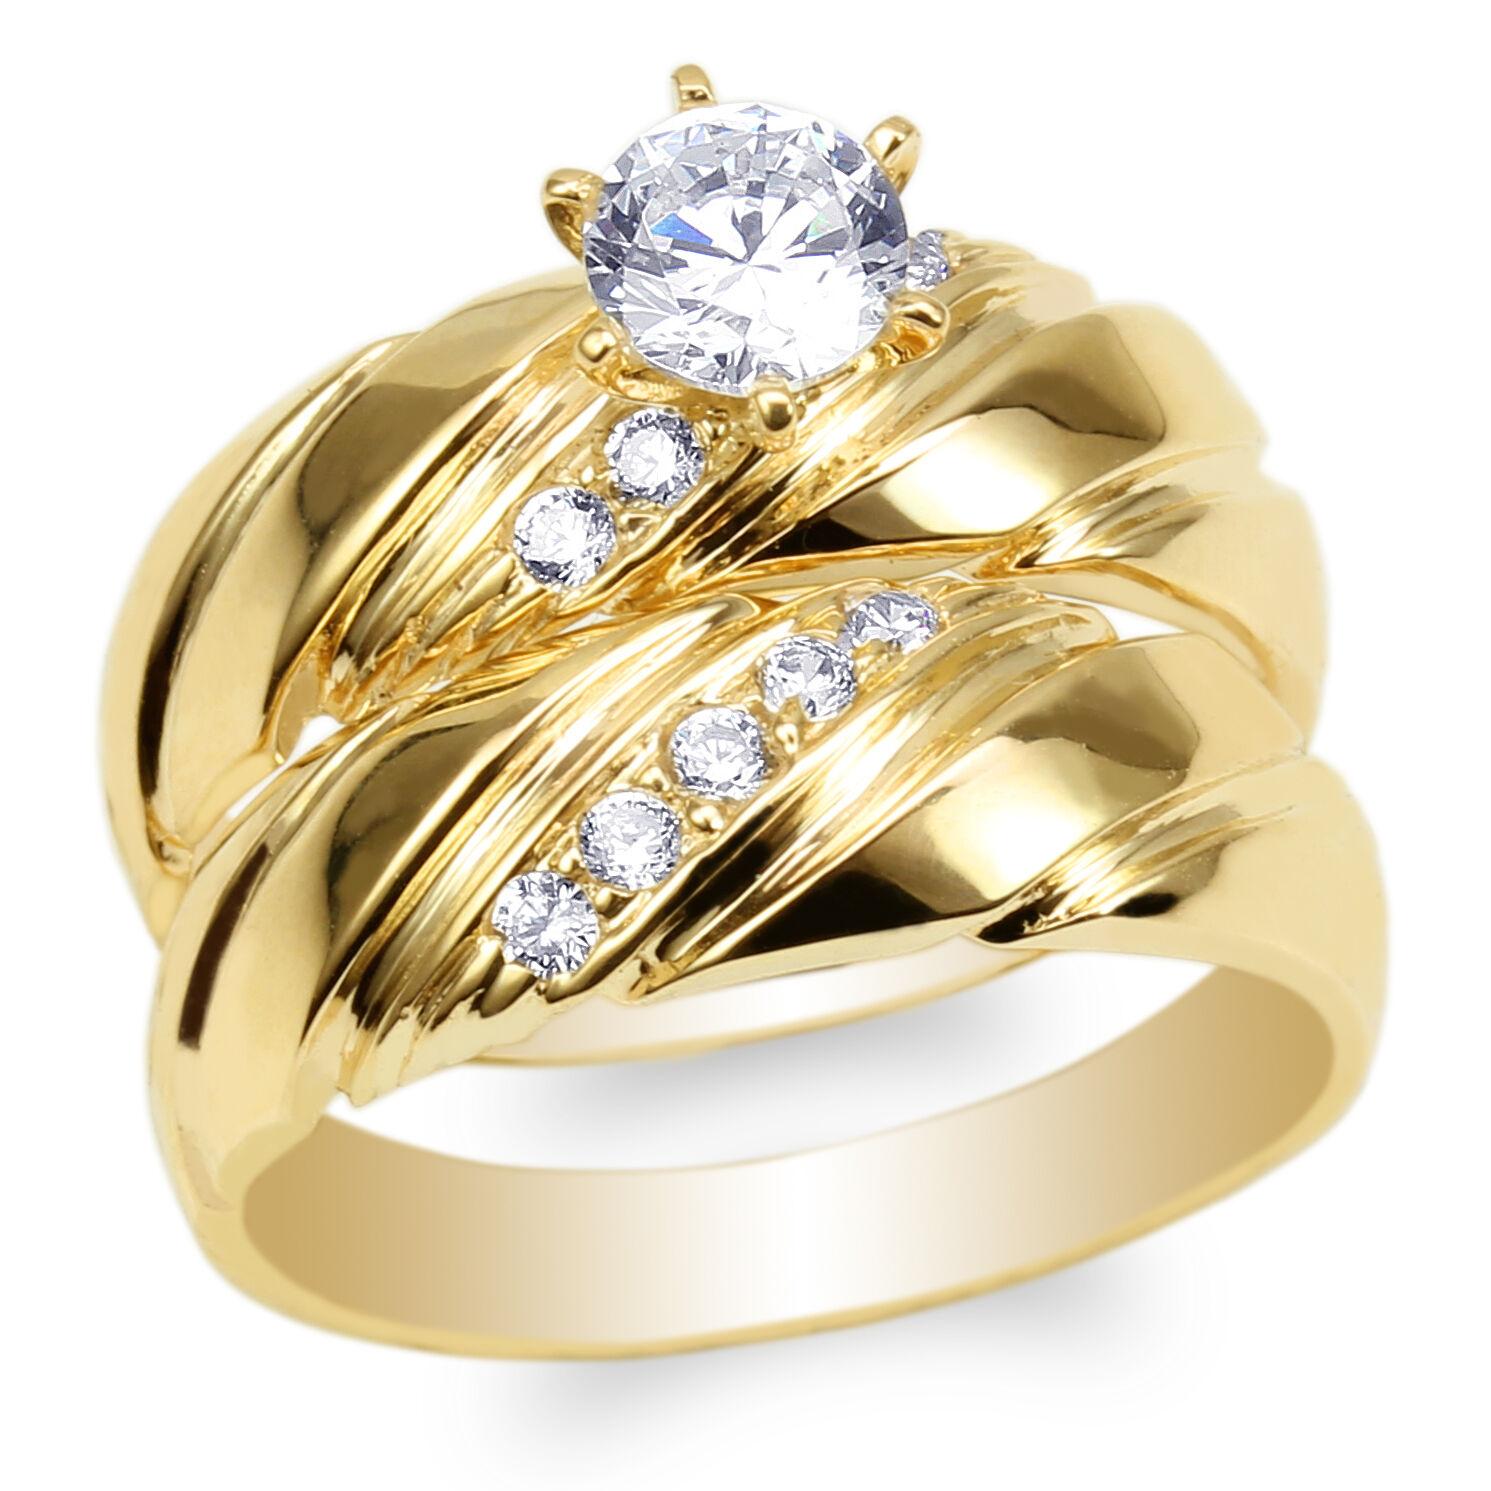 Womens Set Yellow gold Plated Round CZ Luxury Wedding Fashion Ring Size 4-10